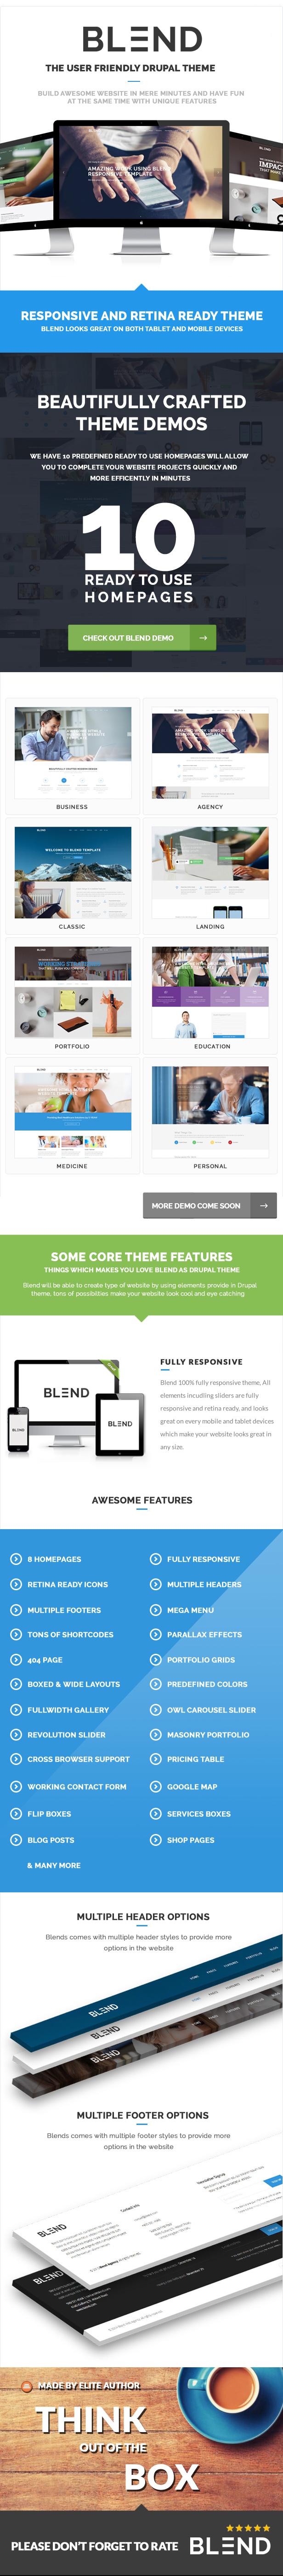 Blend - Multi-Purpose Responsive Drupal 8 Theme